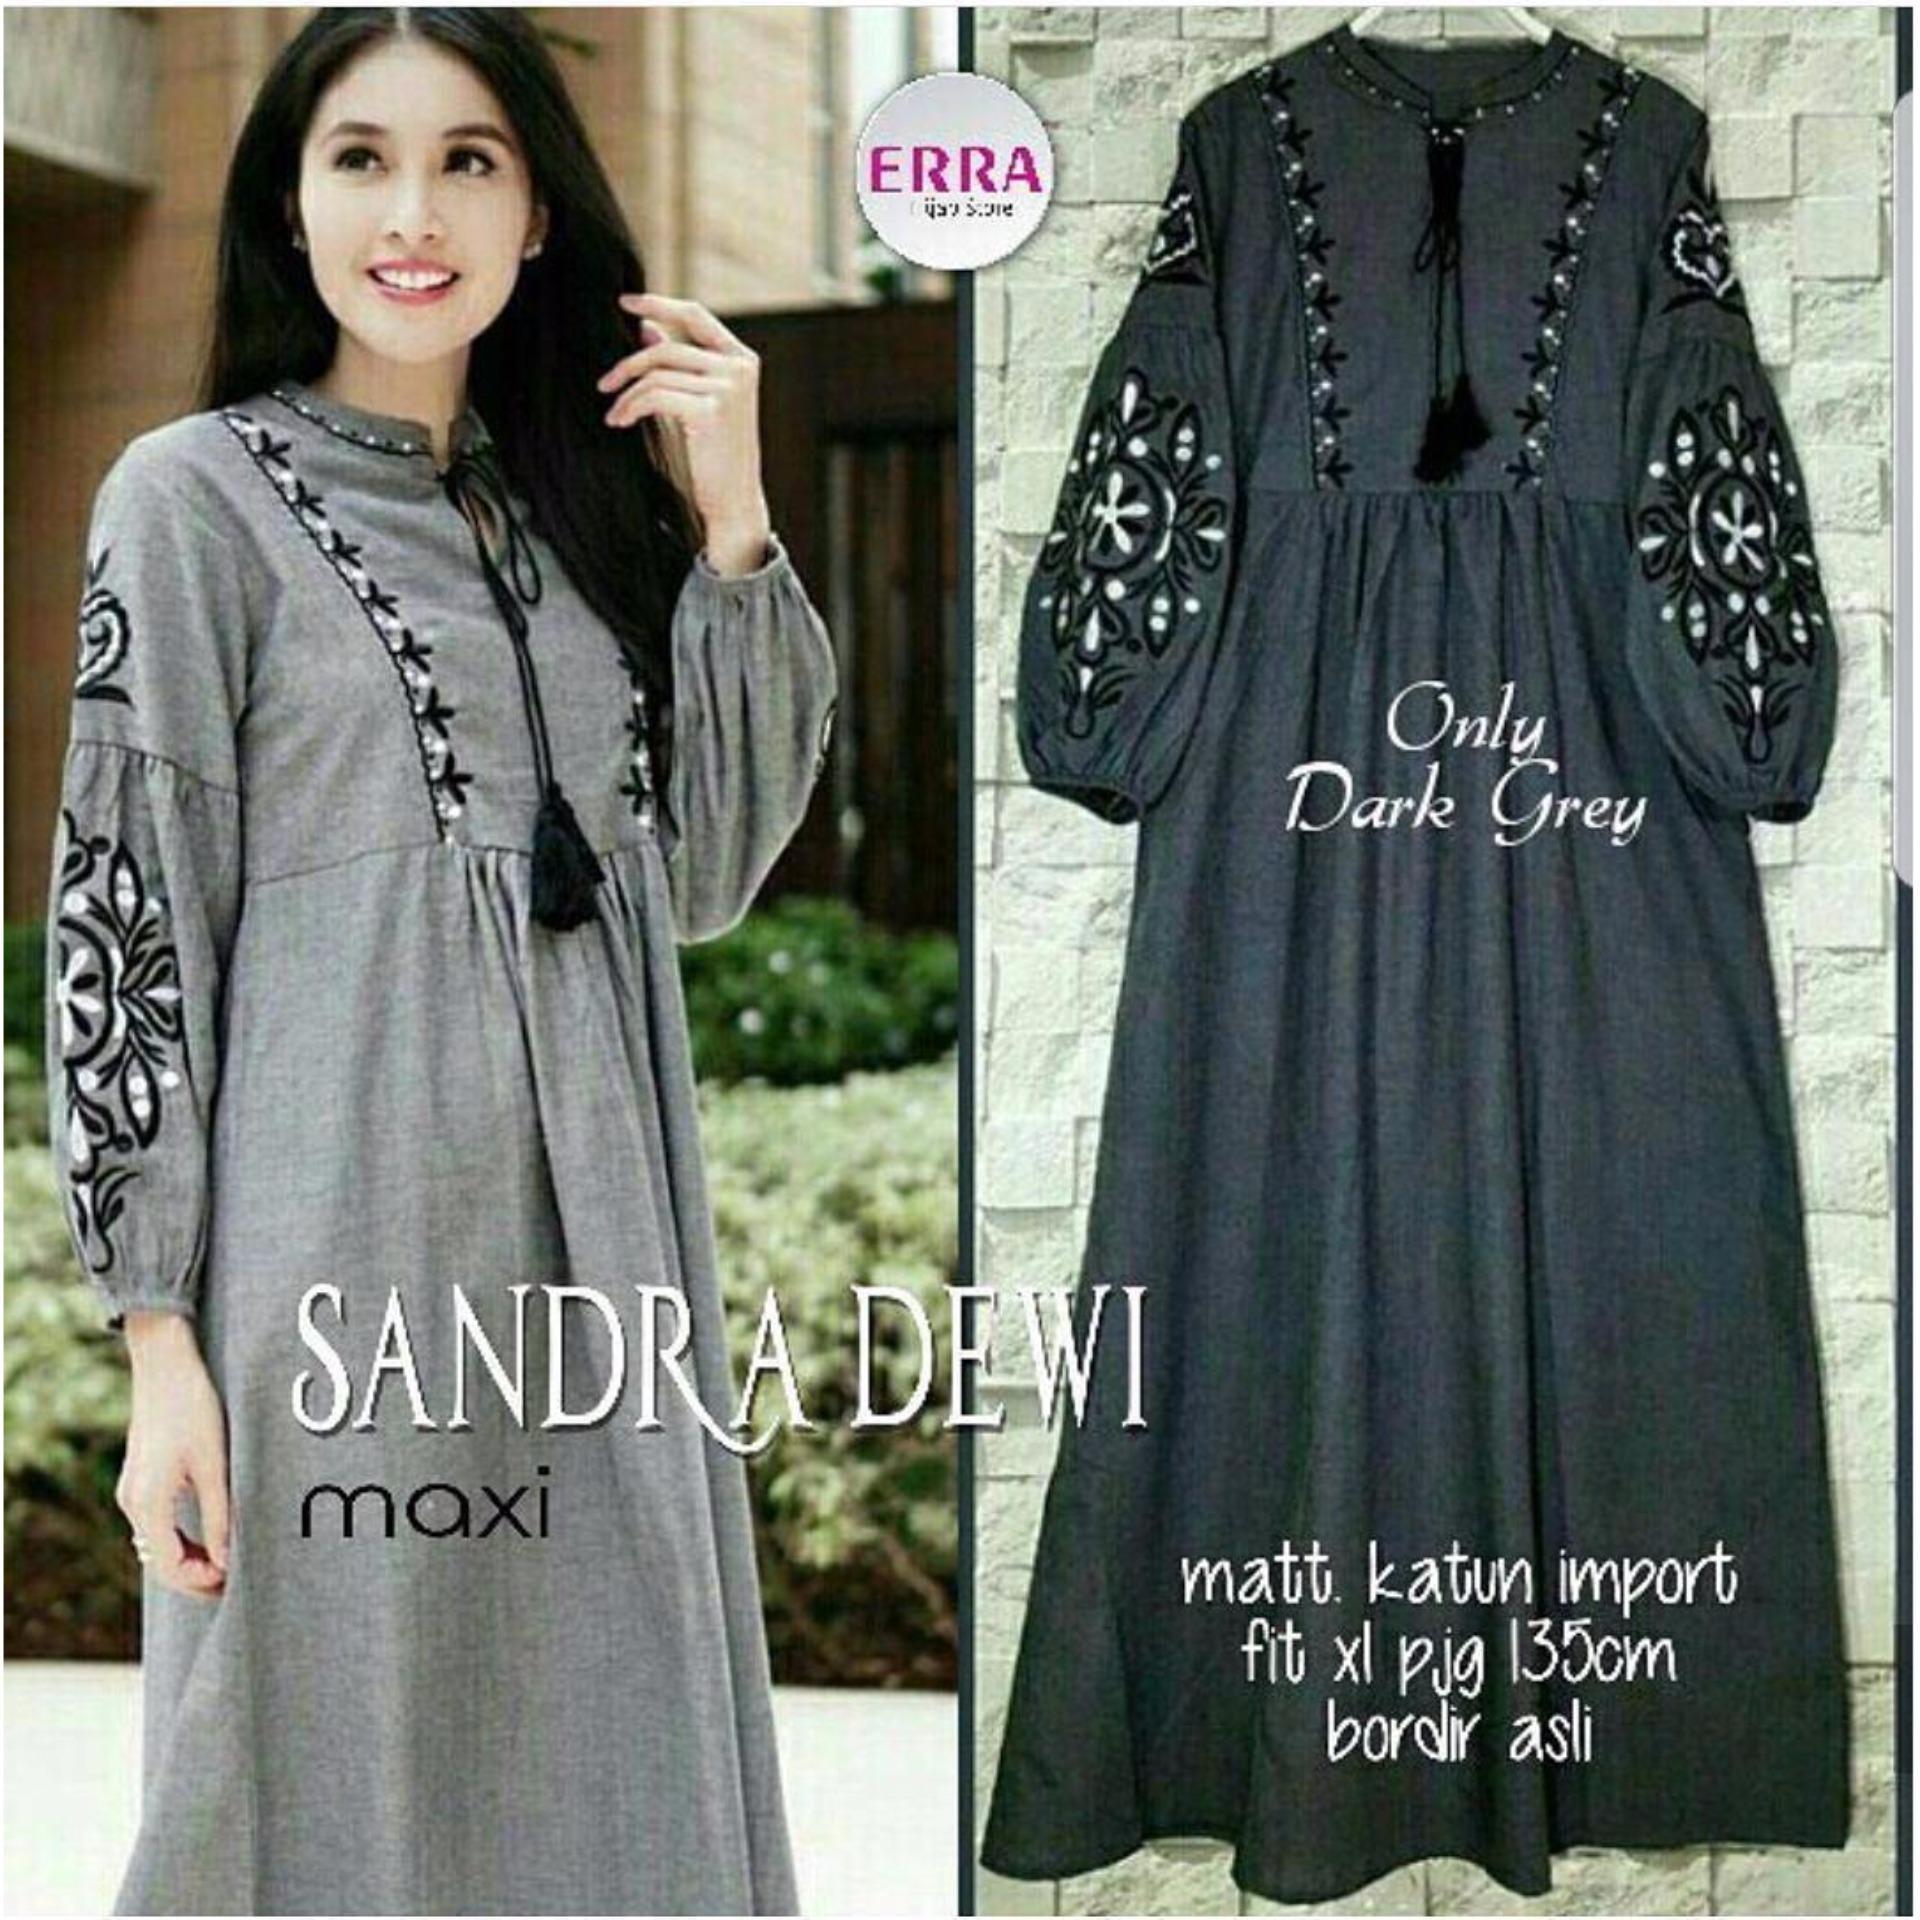 ... Model Elegan Baju Original Dress Sandra Dewi Maxi Gamis Baju Panjang Casual Wanita Hijab Baju Modern